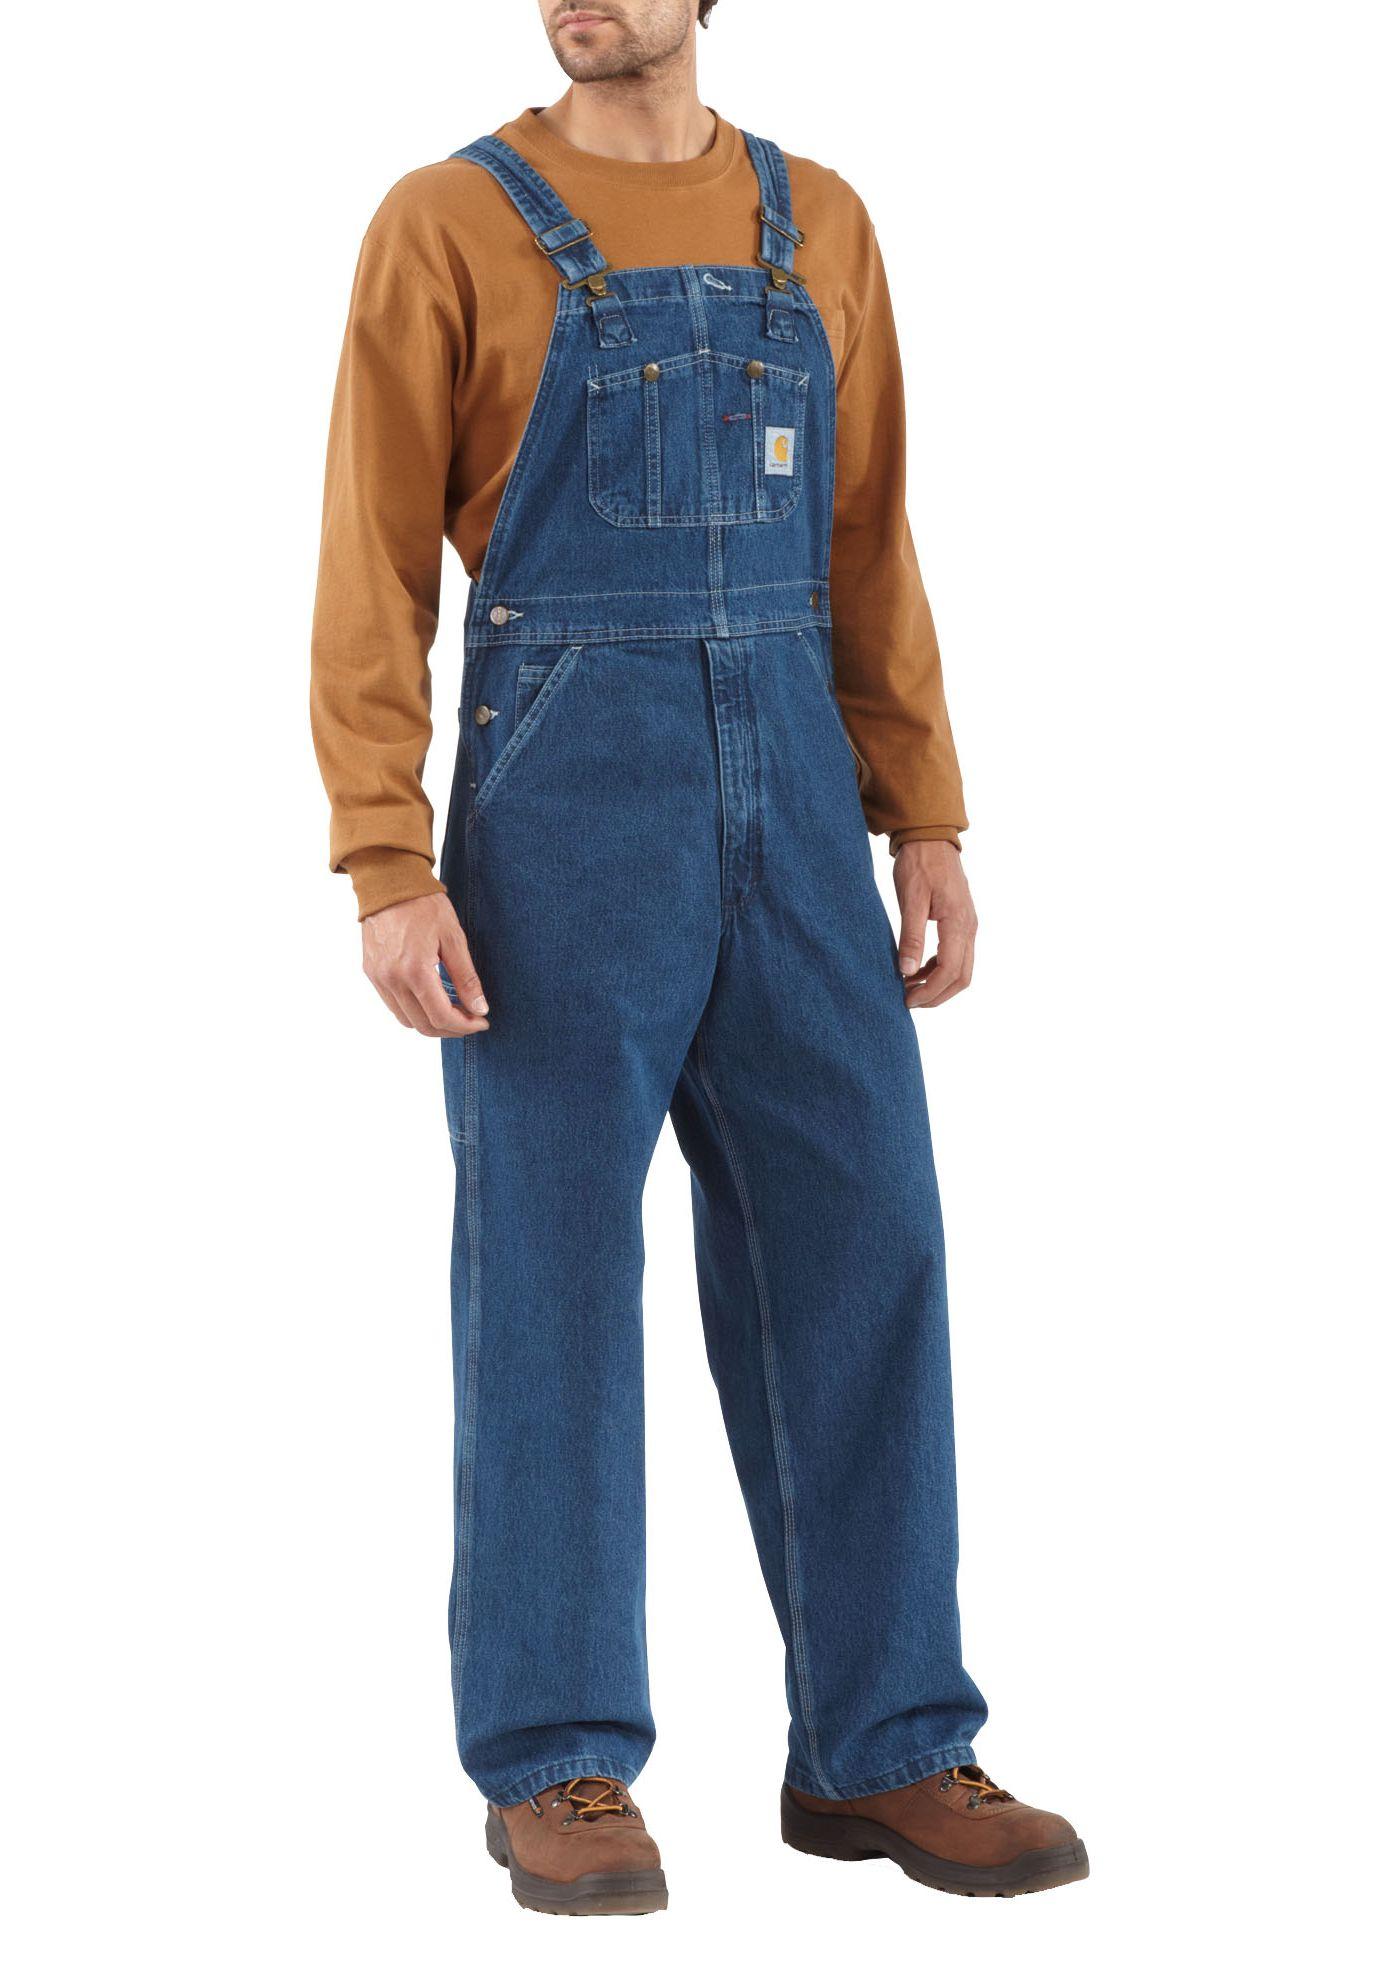 Carhartt Men's Washed Denim Bibs (Regular and Big & Tall)